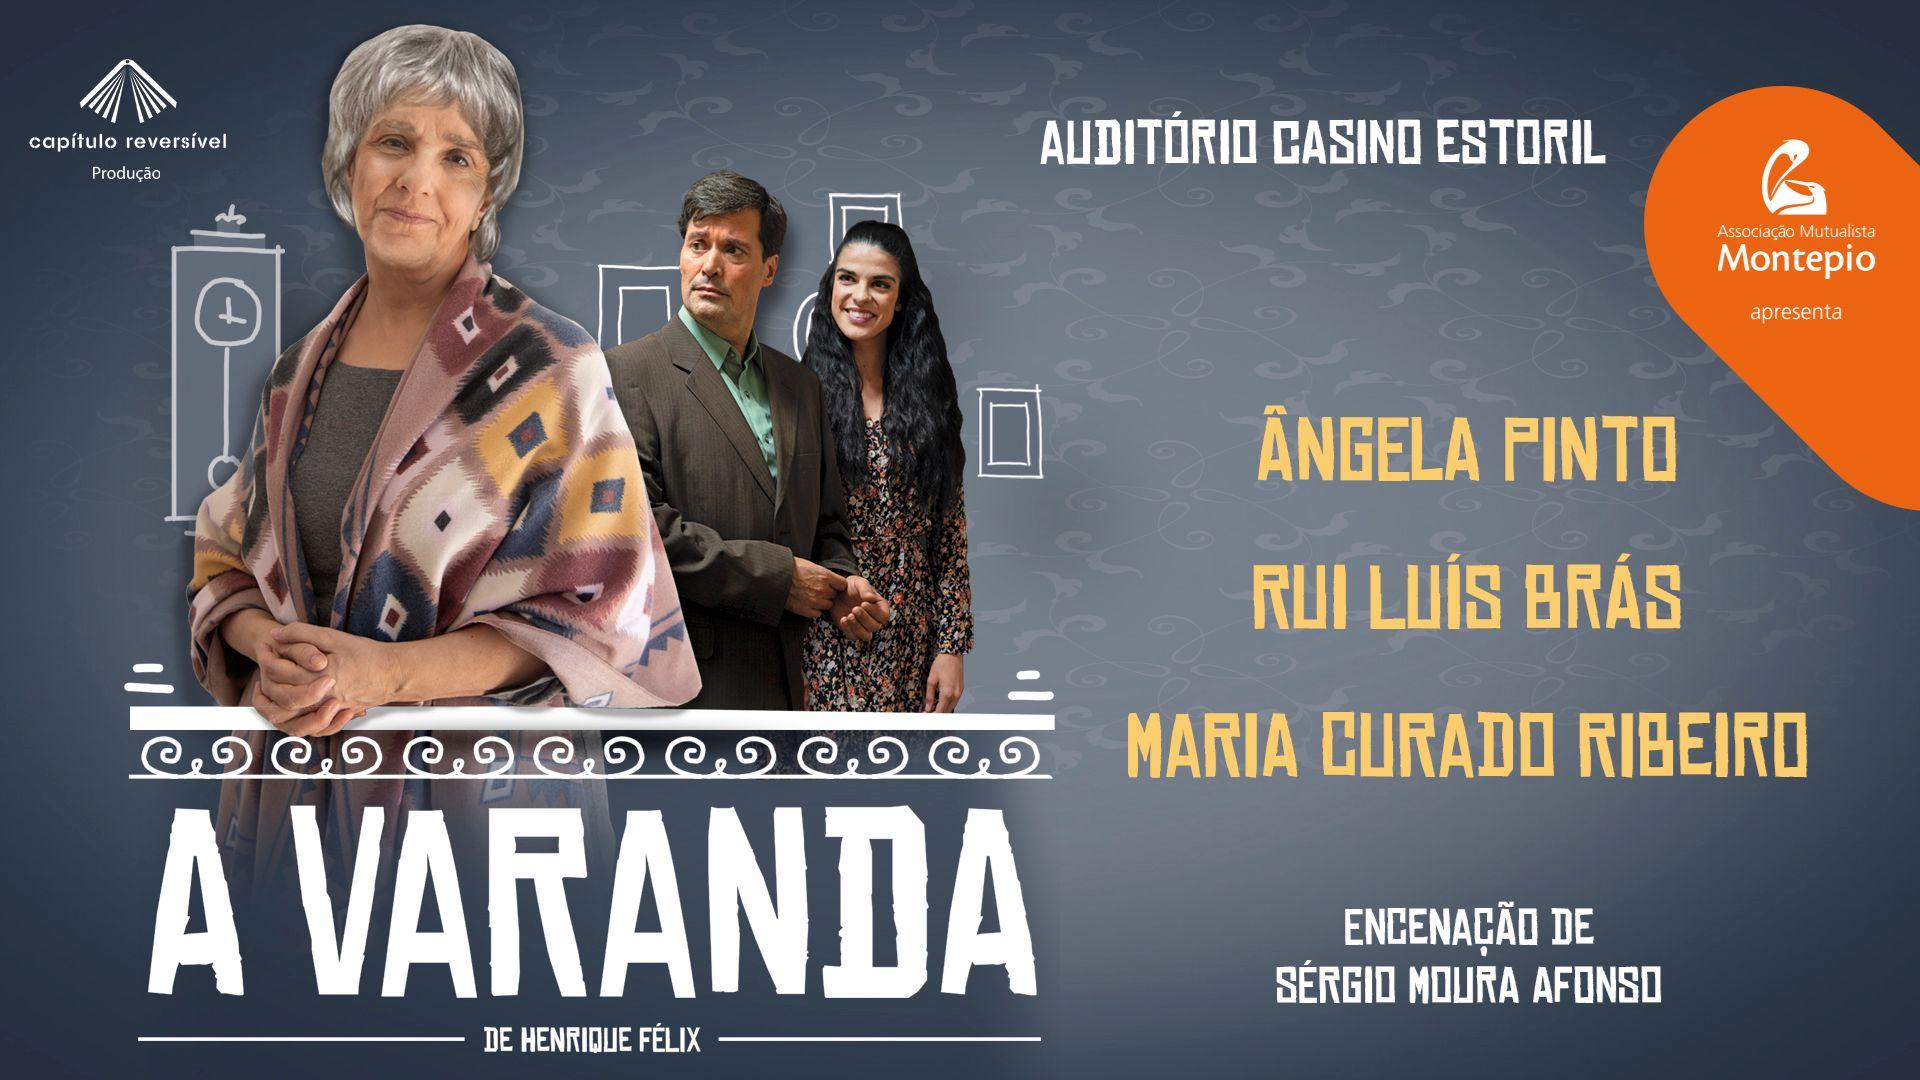 "Photo of ""A Varanda"" in national debut in the Casino Estoril Auditorium"